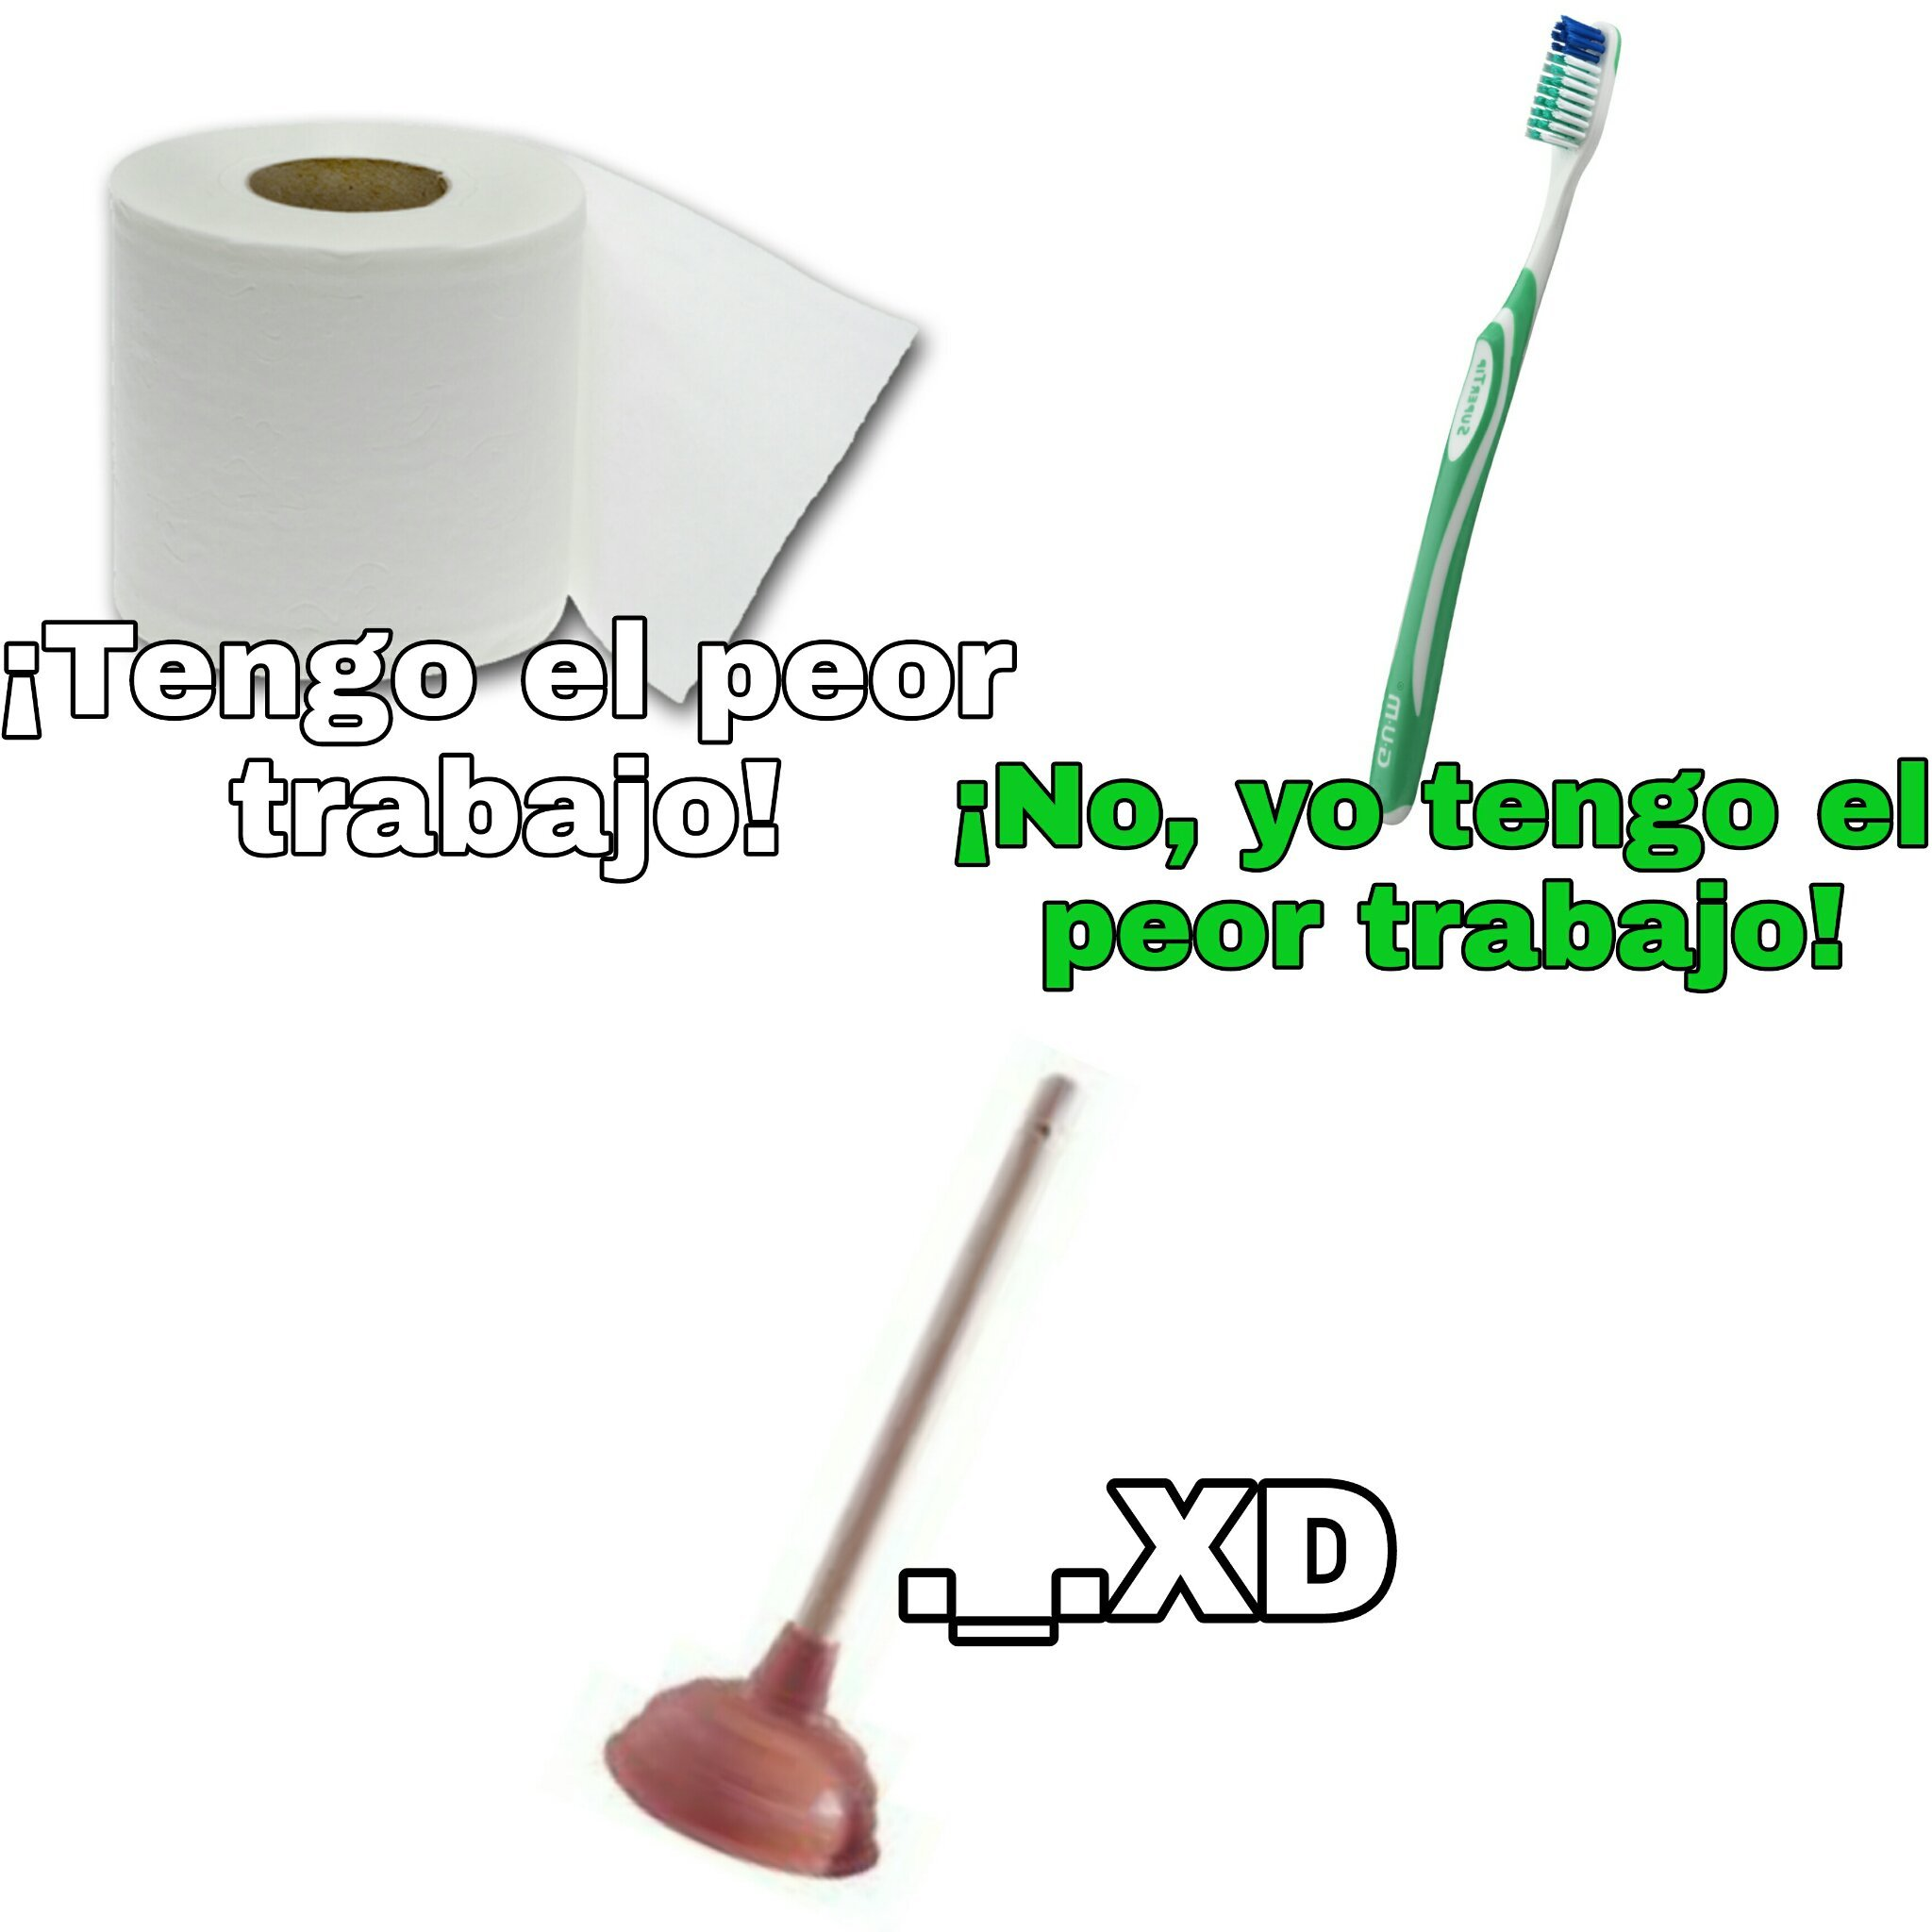 Pobre Objeto - meme